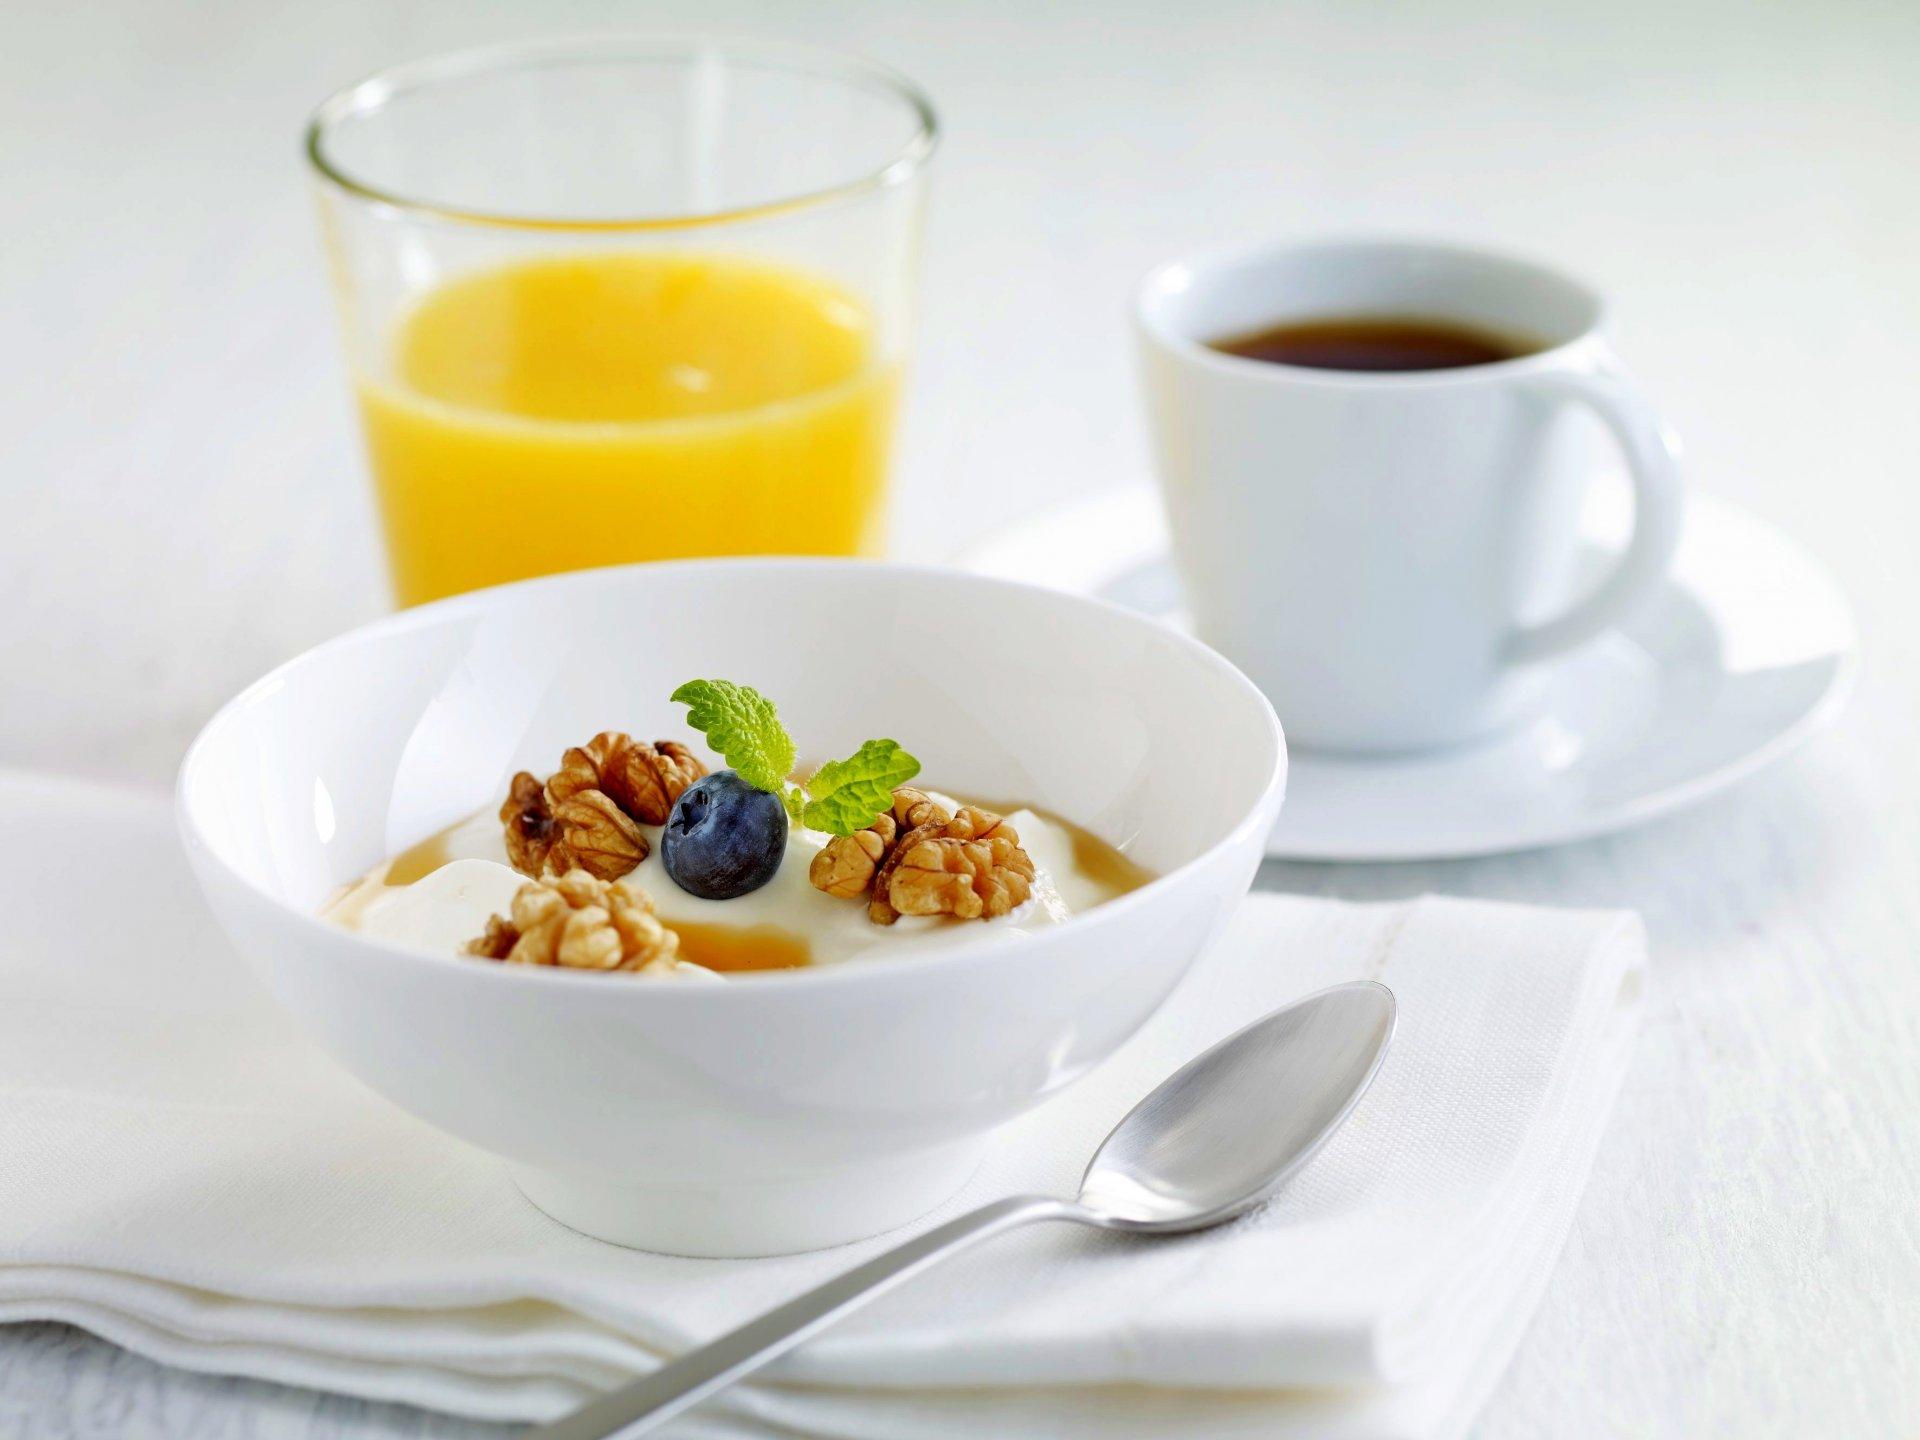 Завтрак в картинках, коллеге программисту днем